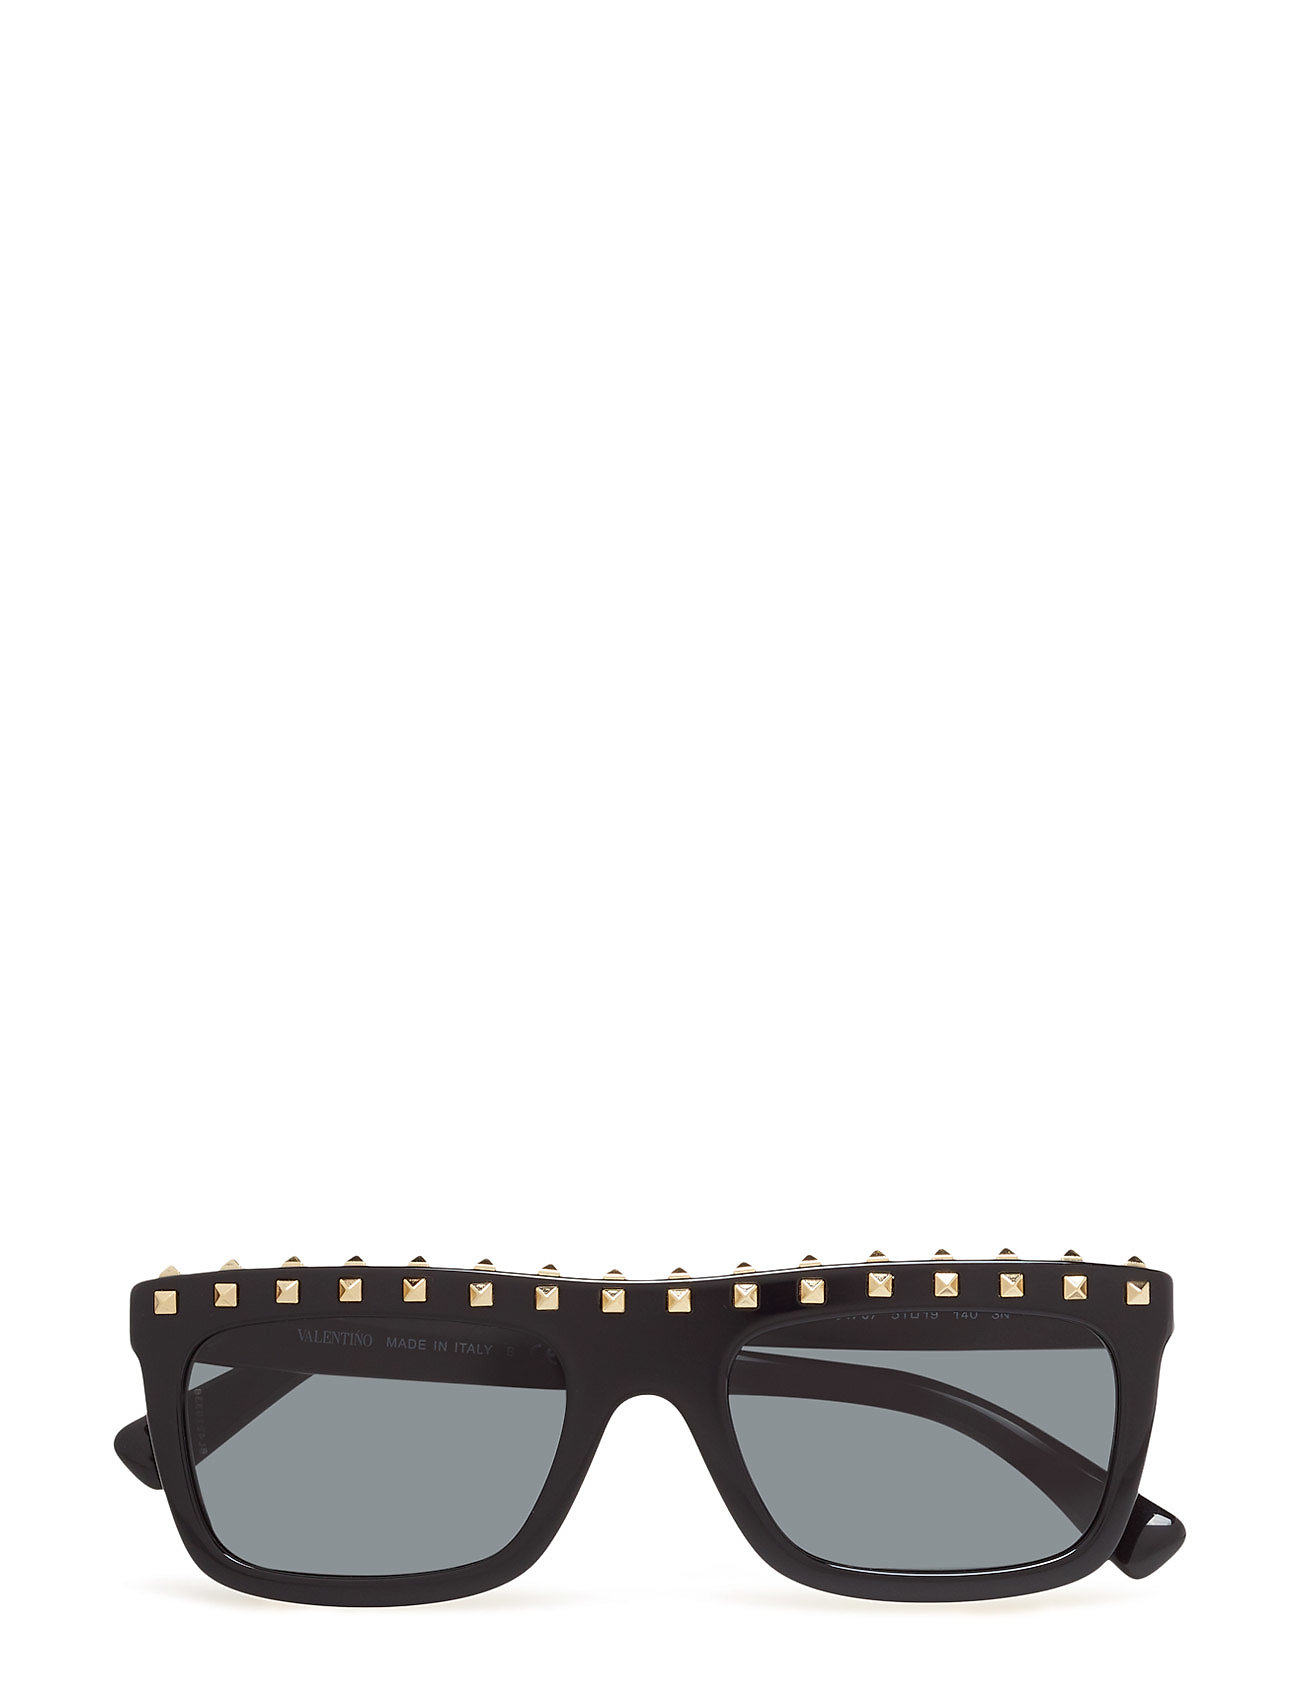 valentino sunglasses – Soul rockstud fra boozt.com dk